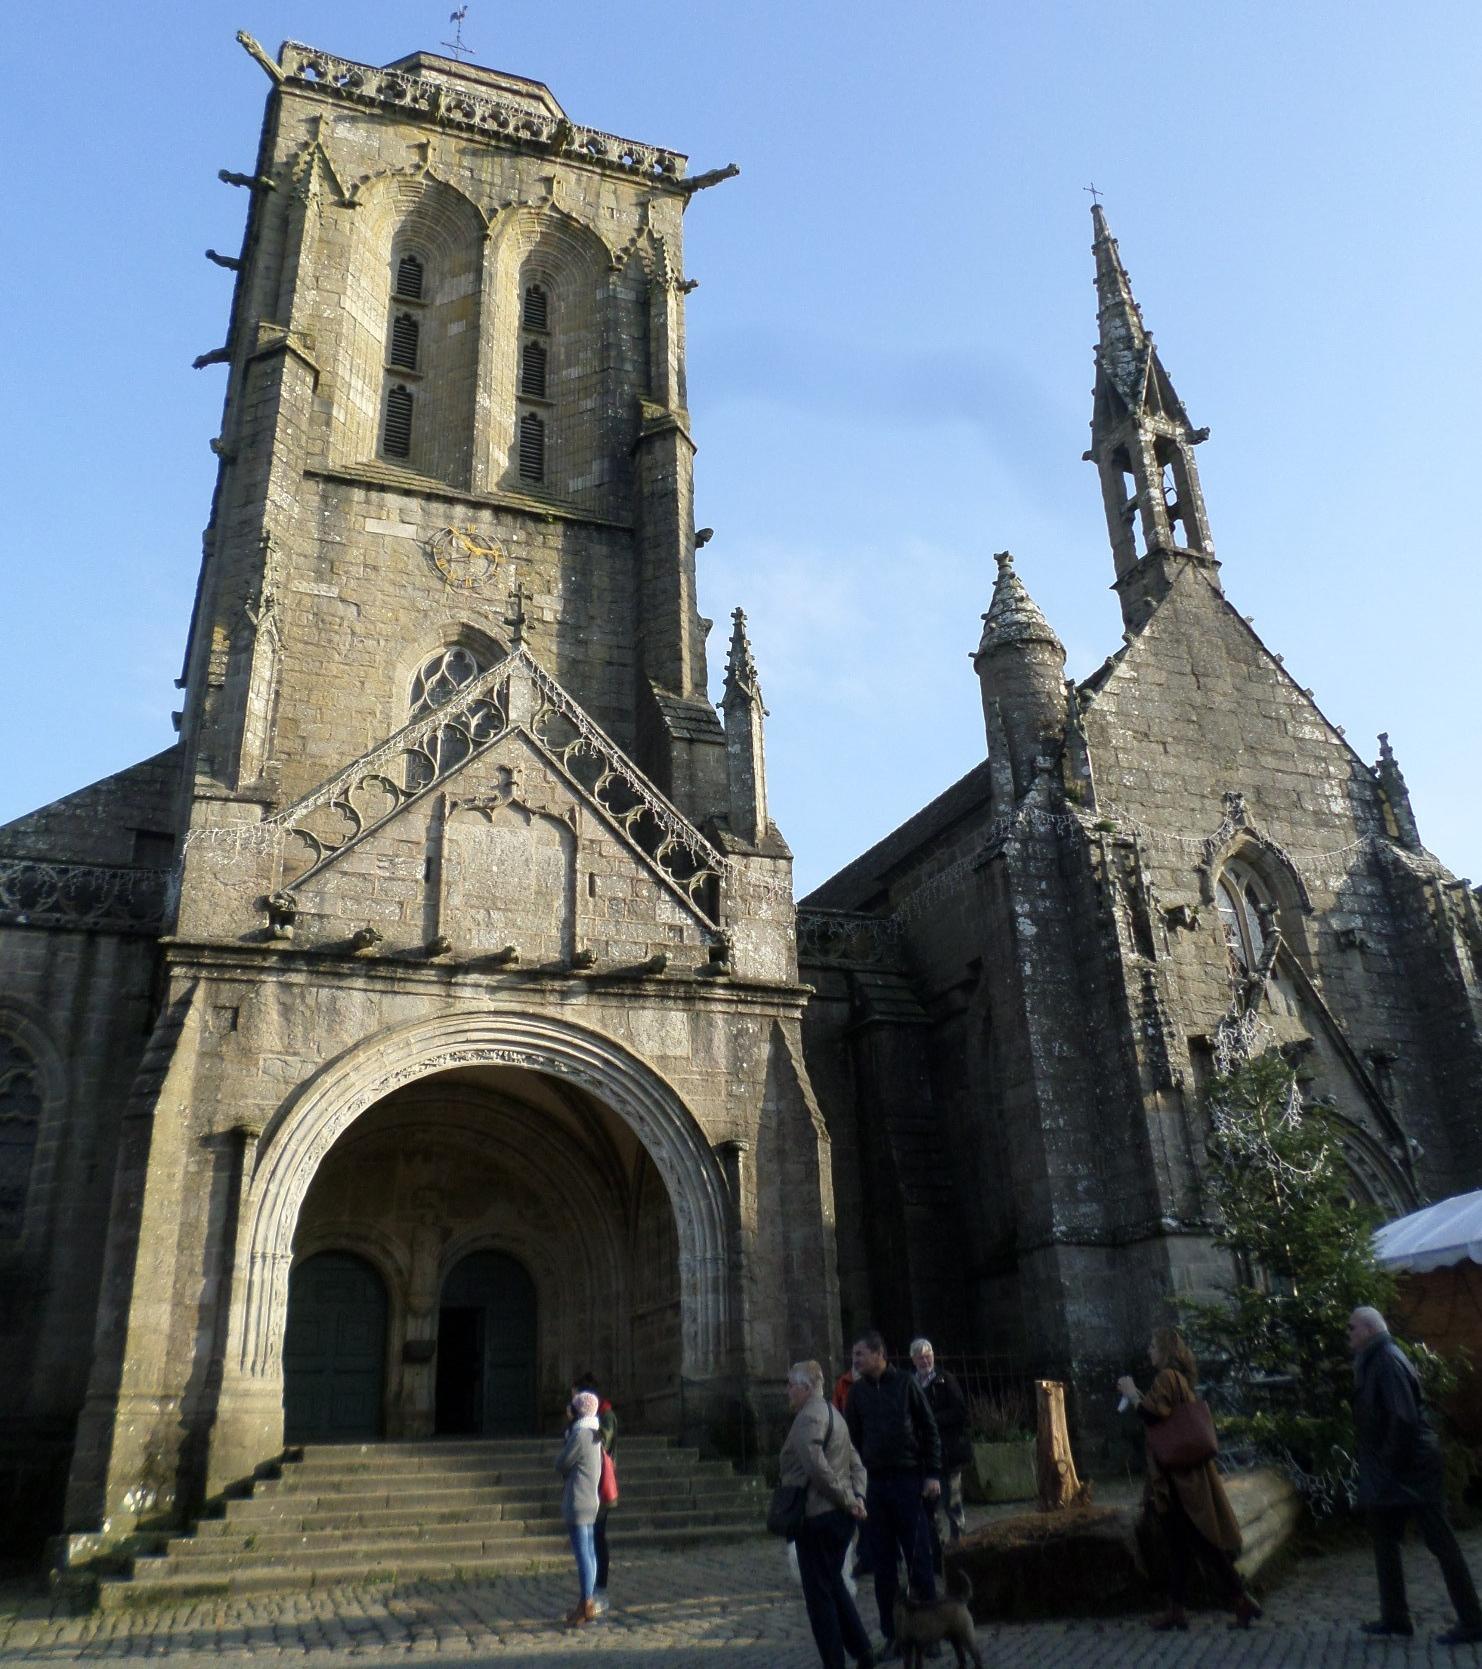 locronan-ch-st-ronan-et-chapelle-piety dec15